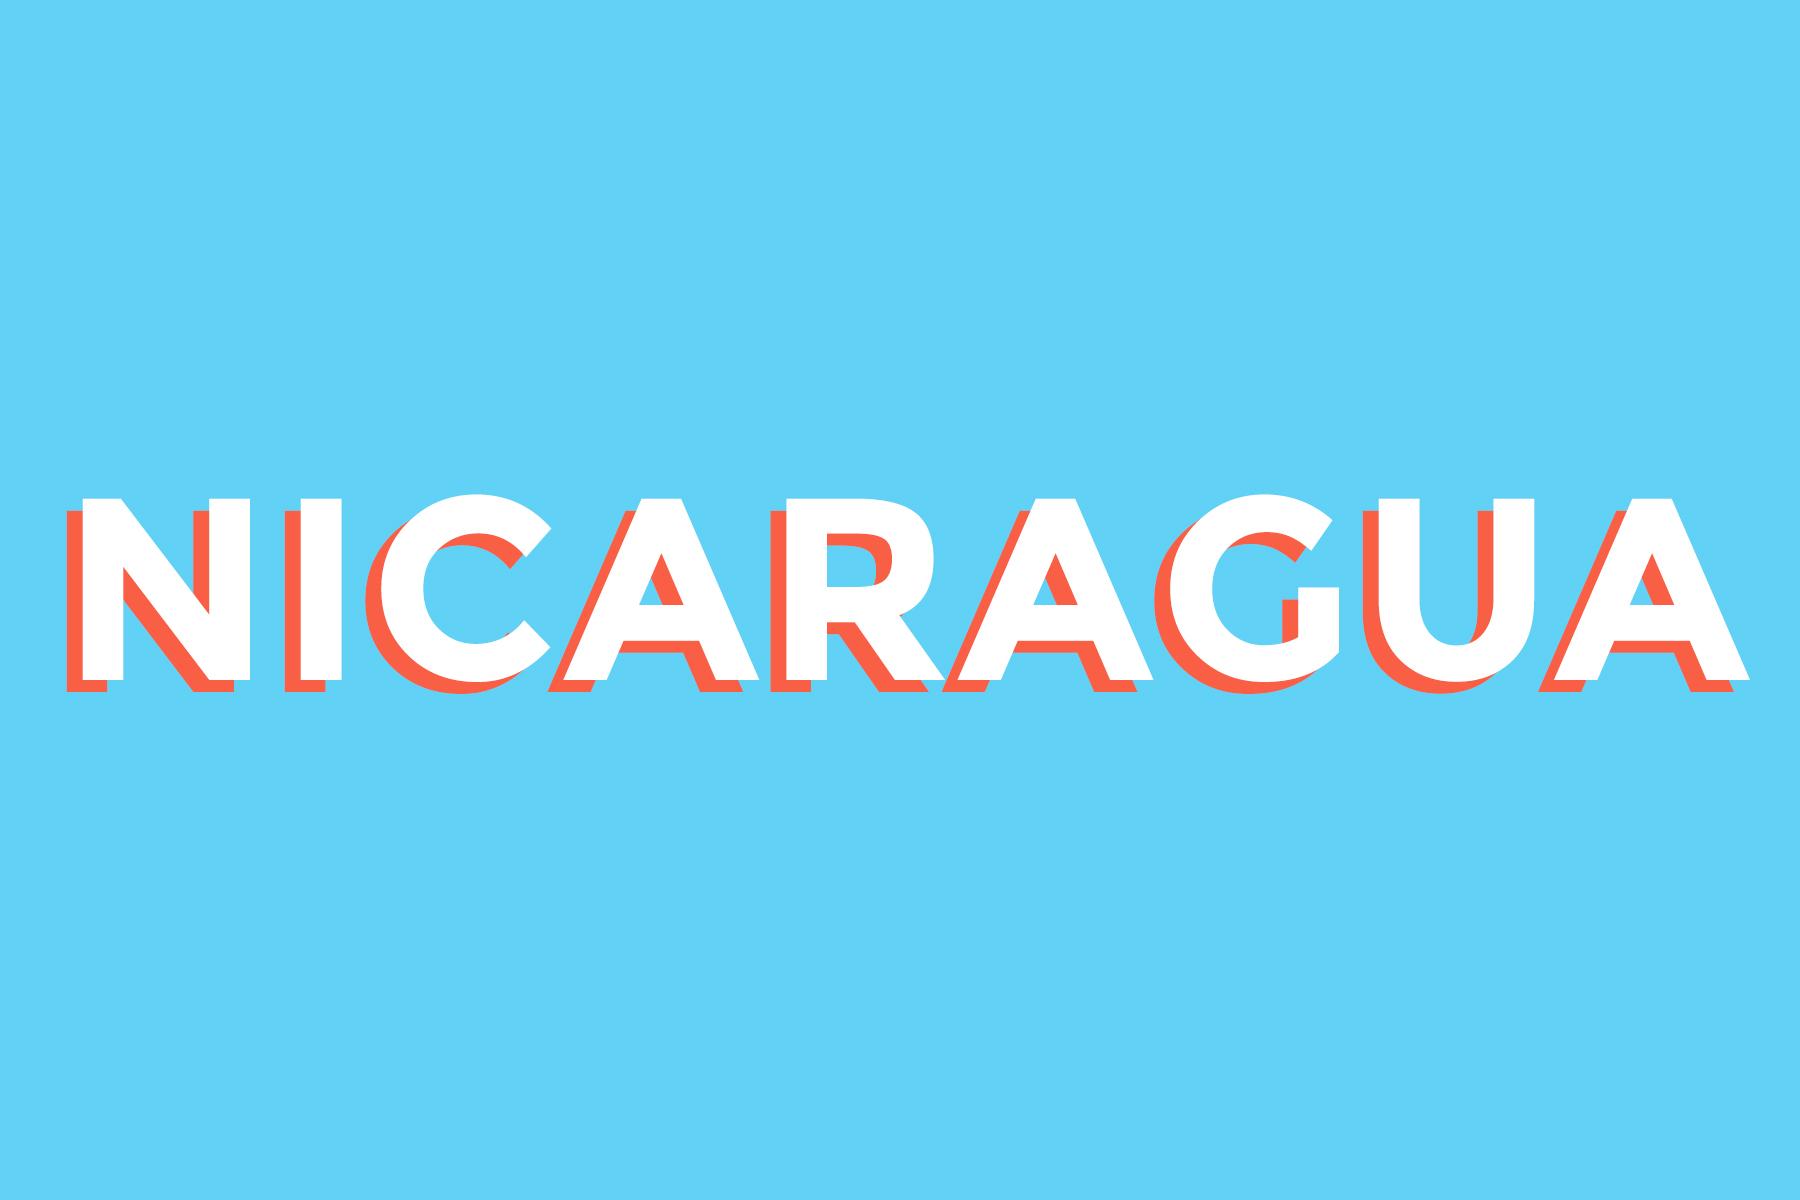 Immersive group travel to Nicaragua 2018